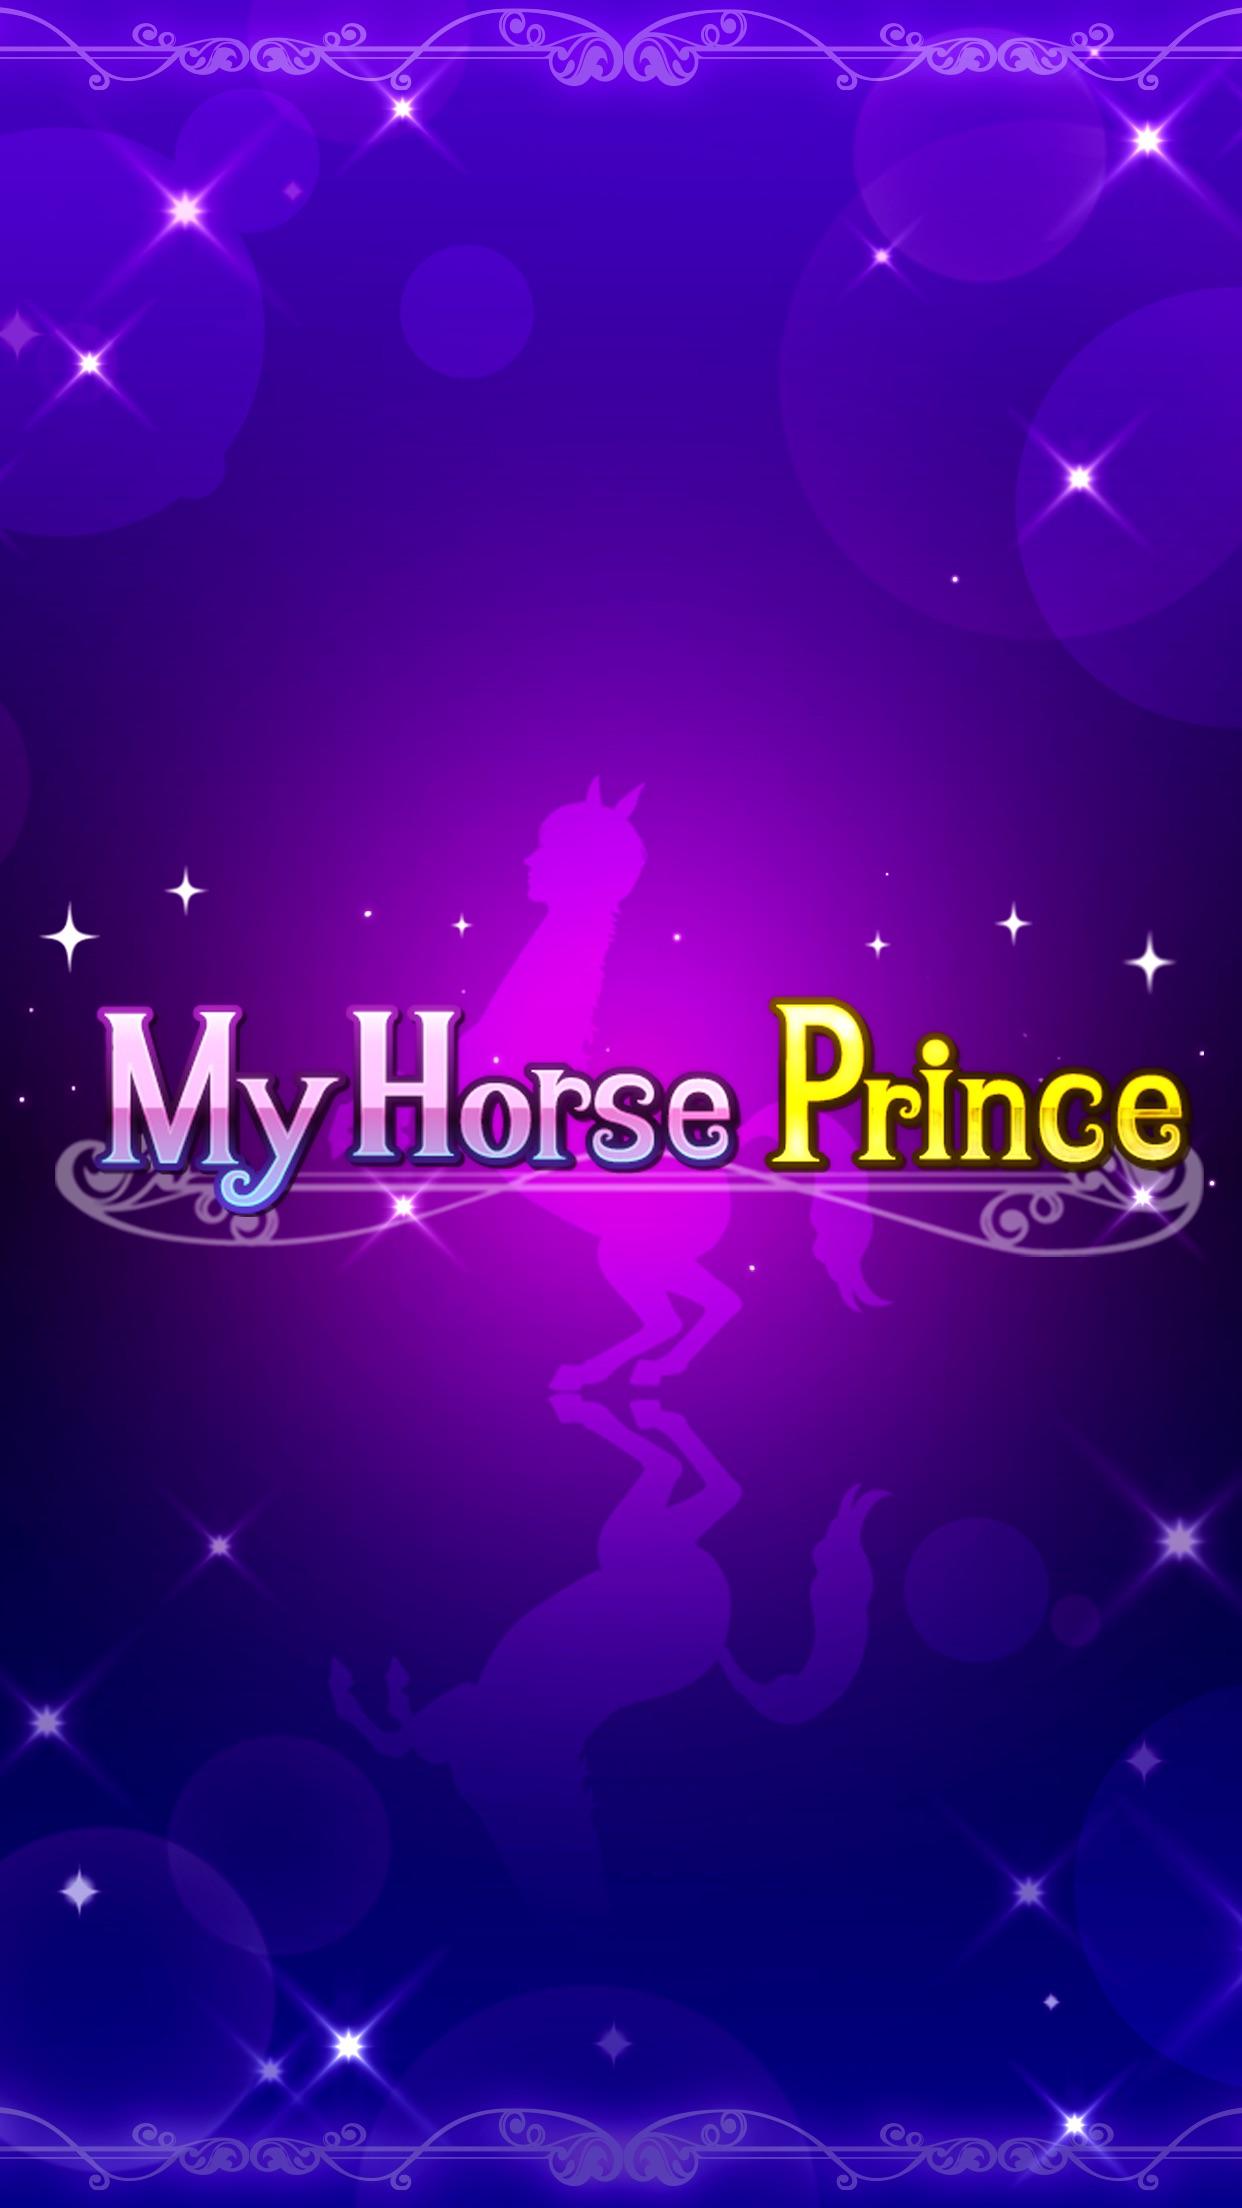 My Horse Prince Screenshot